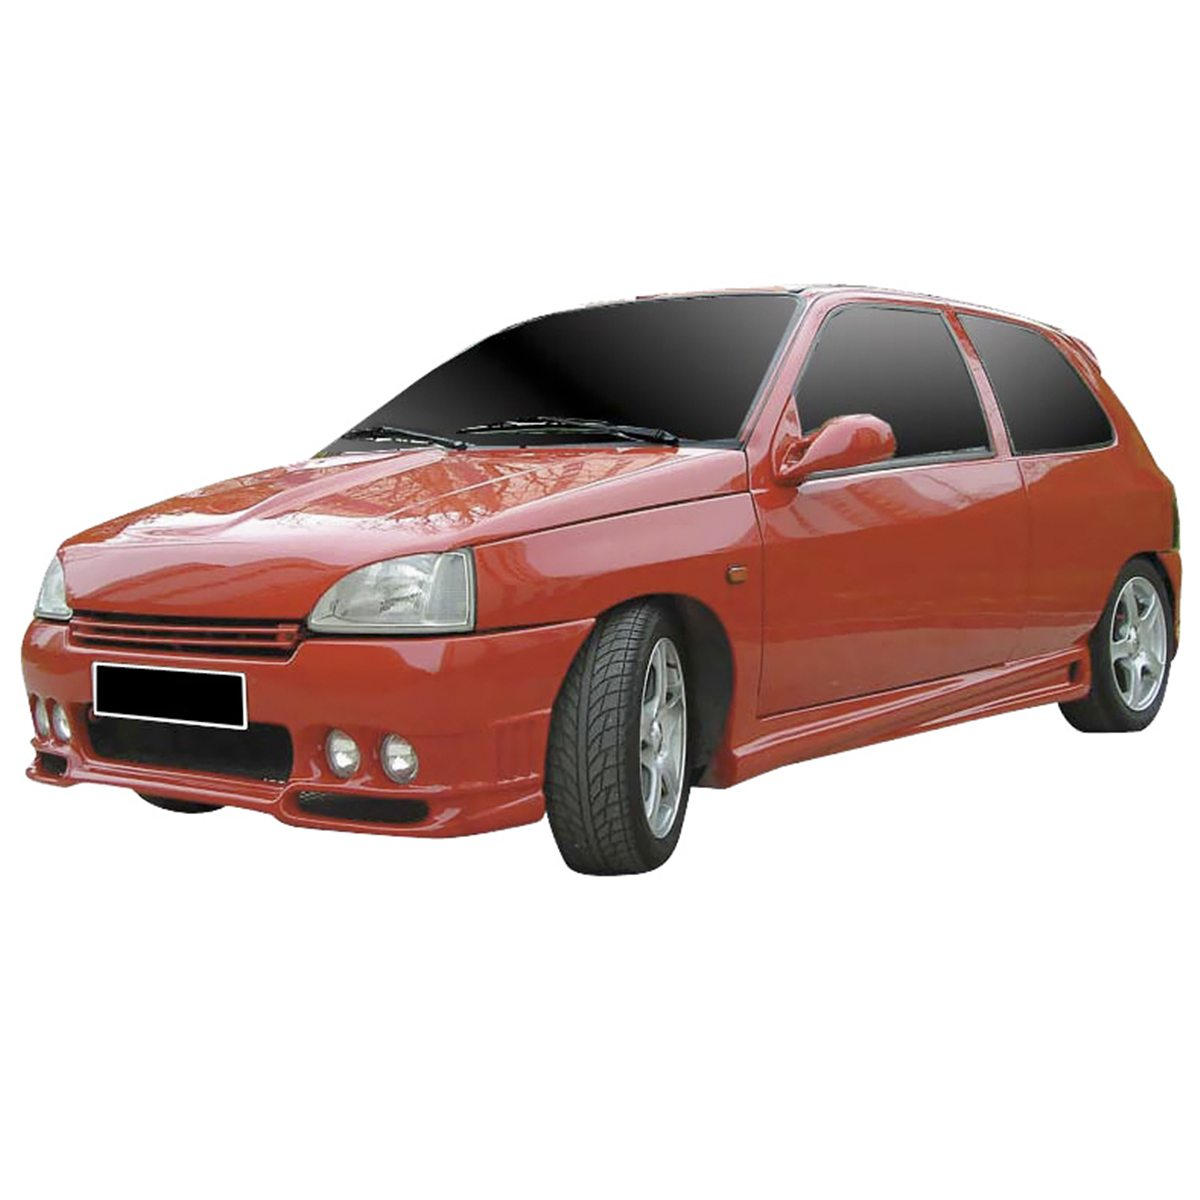 Renault-Clio-92-Sport-Frt-PCA105